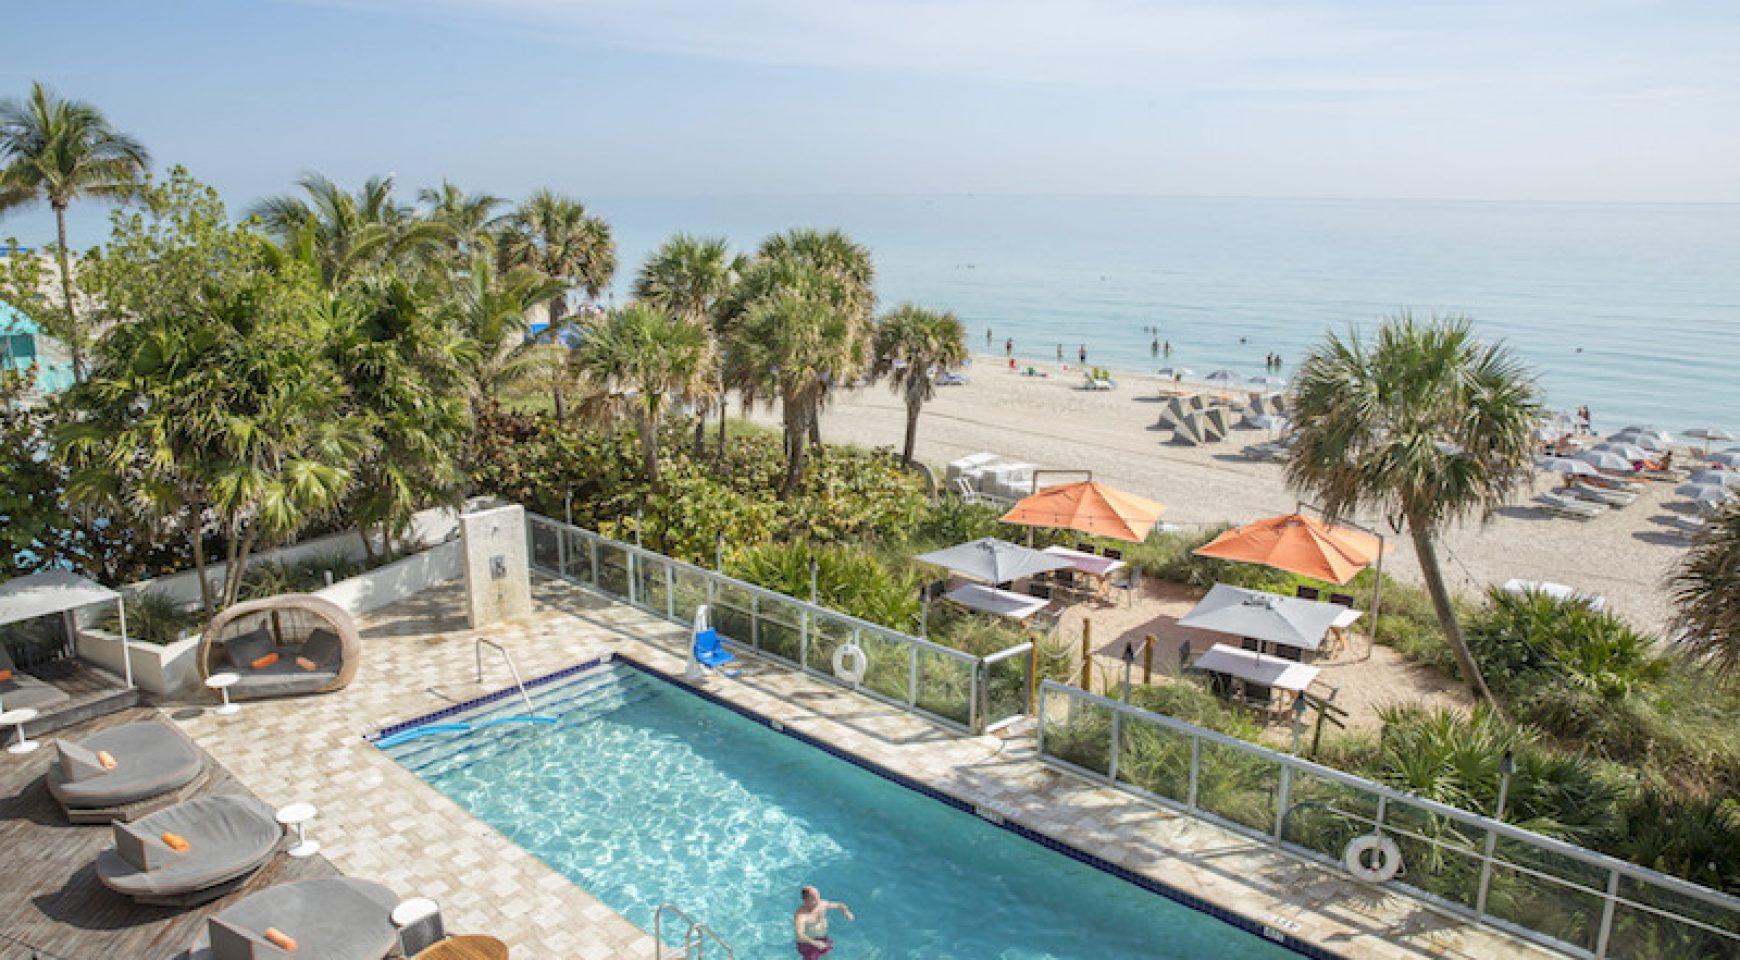 Ocean View Hotel Miami Florida